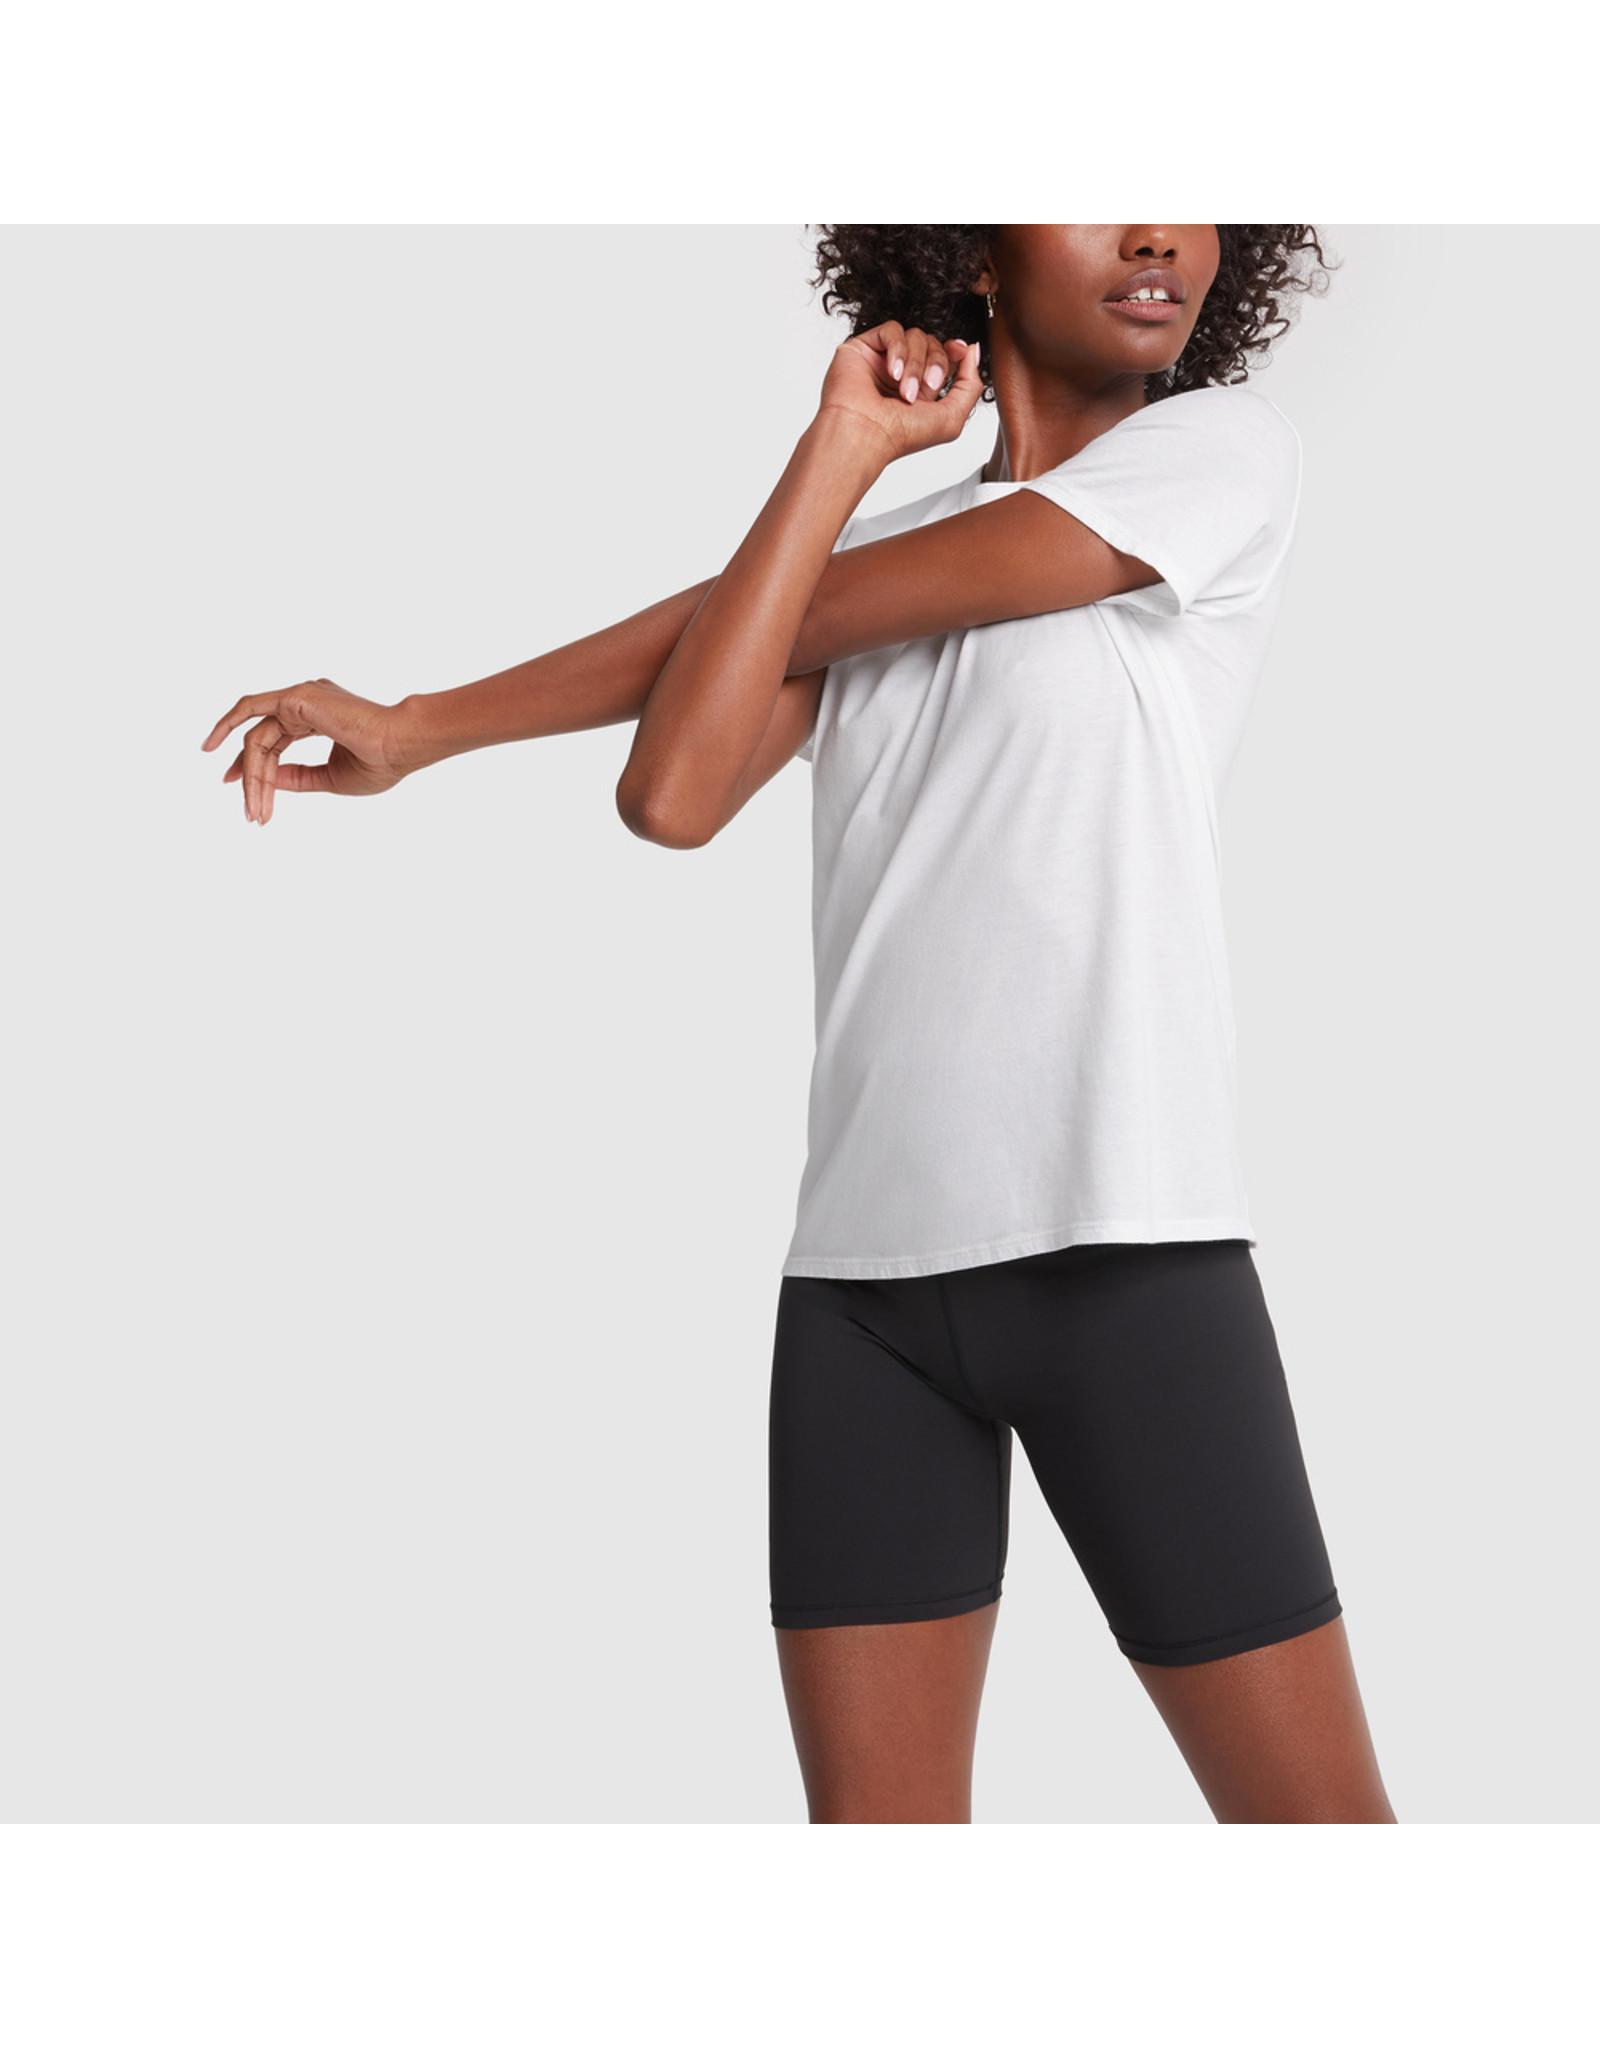 G. Sport x Proenza Schouler G. Sport x Proenza Schouler Lifestyle T-Shirt (Color: White, Size: M)